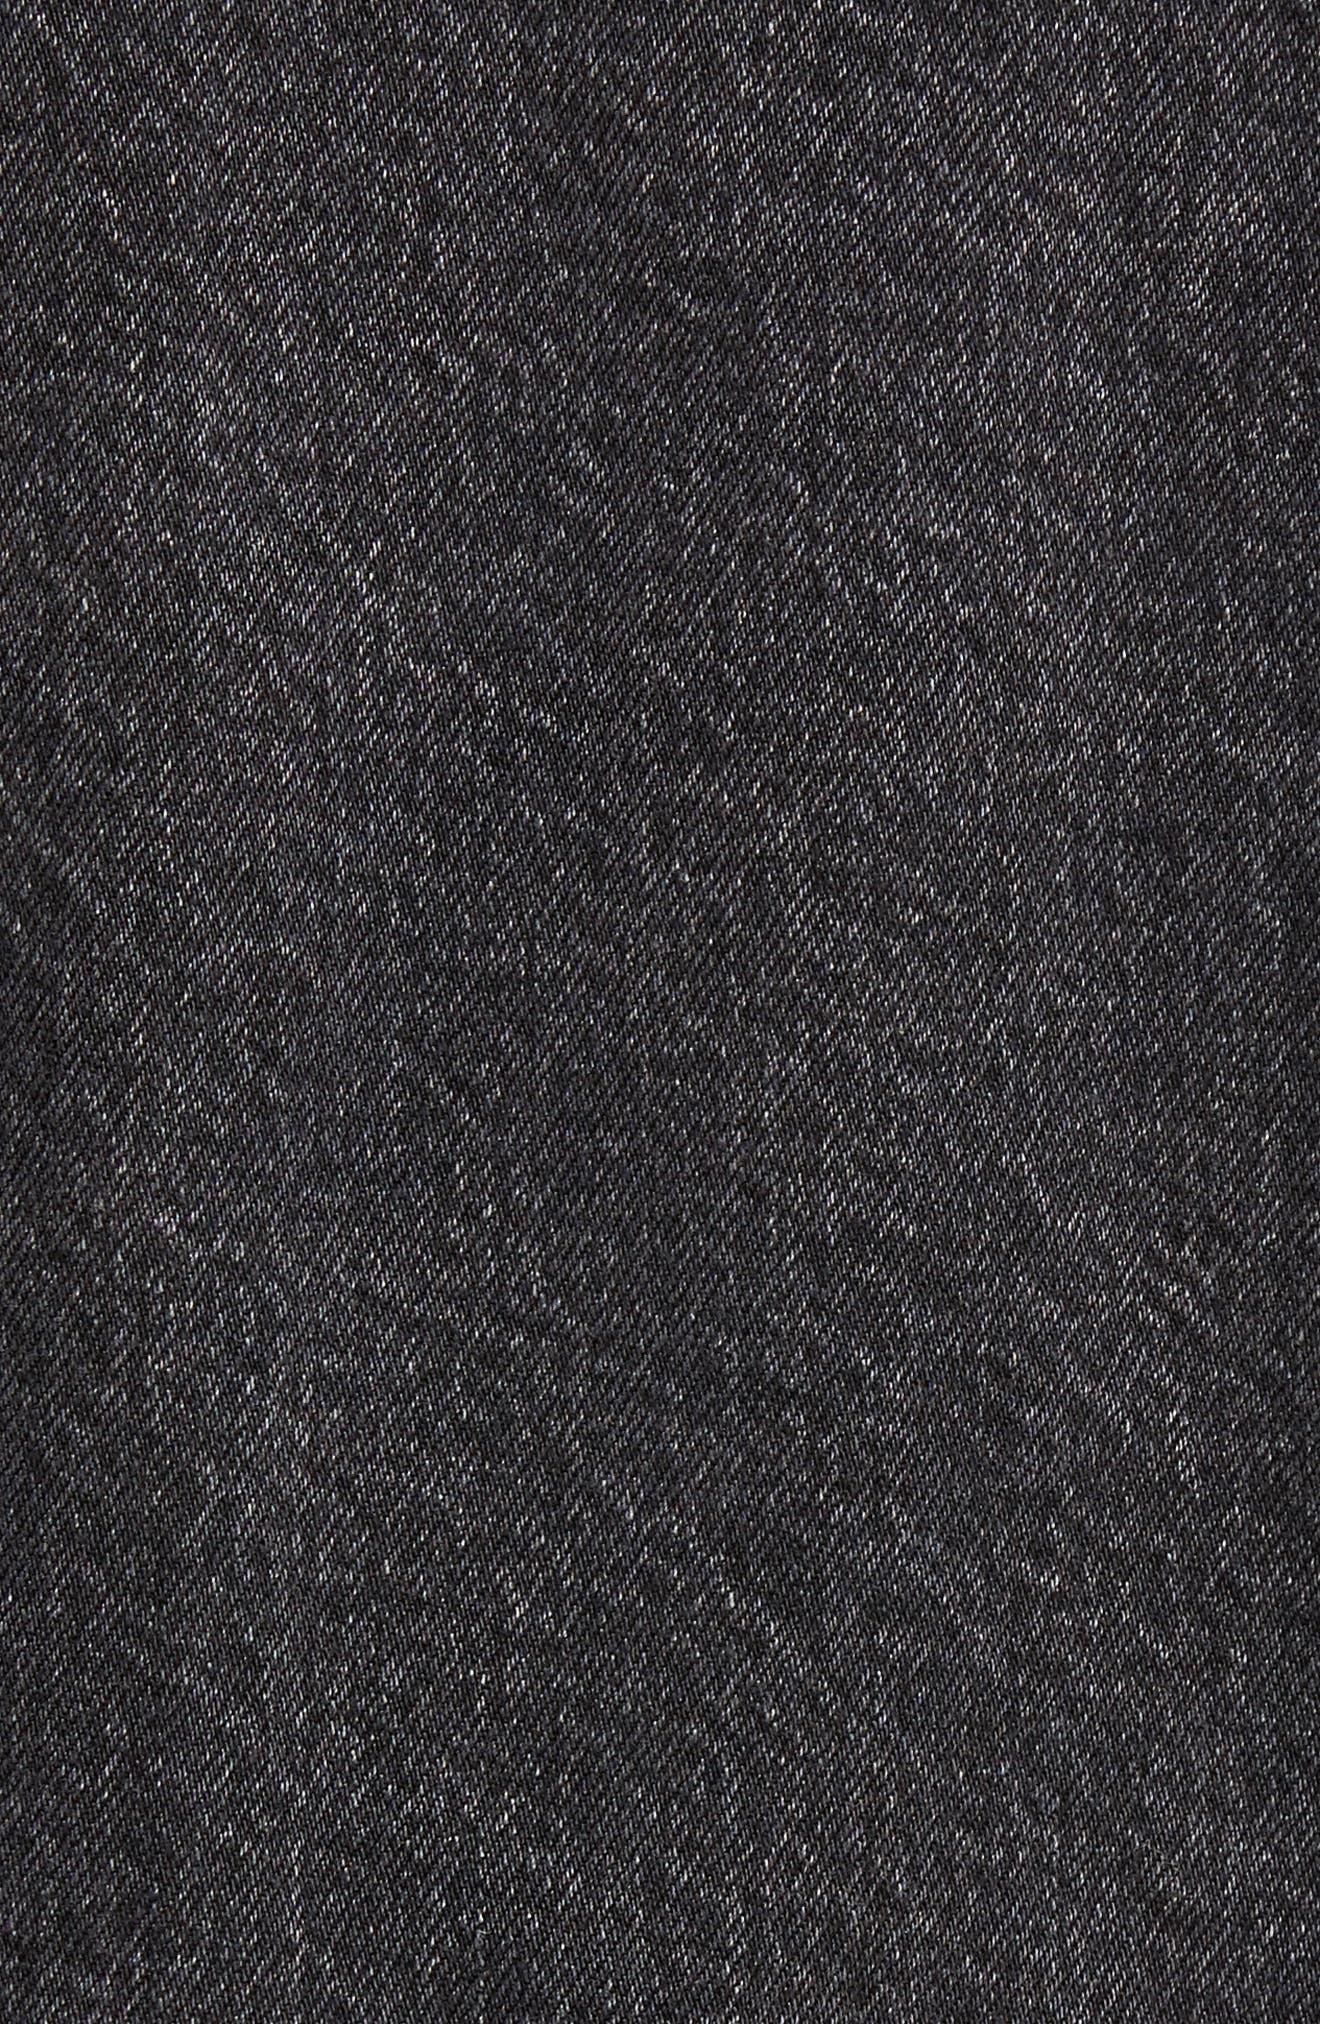 Alternate Image 5  - Levi's® Altered Distressed Denim Trucker Jacket